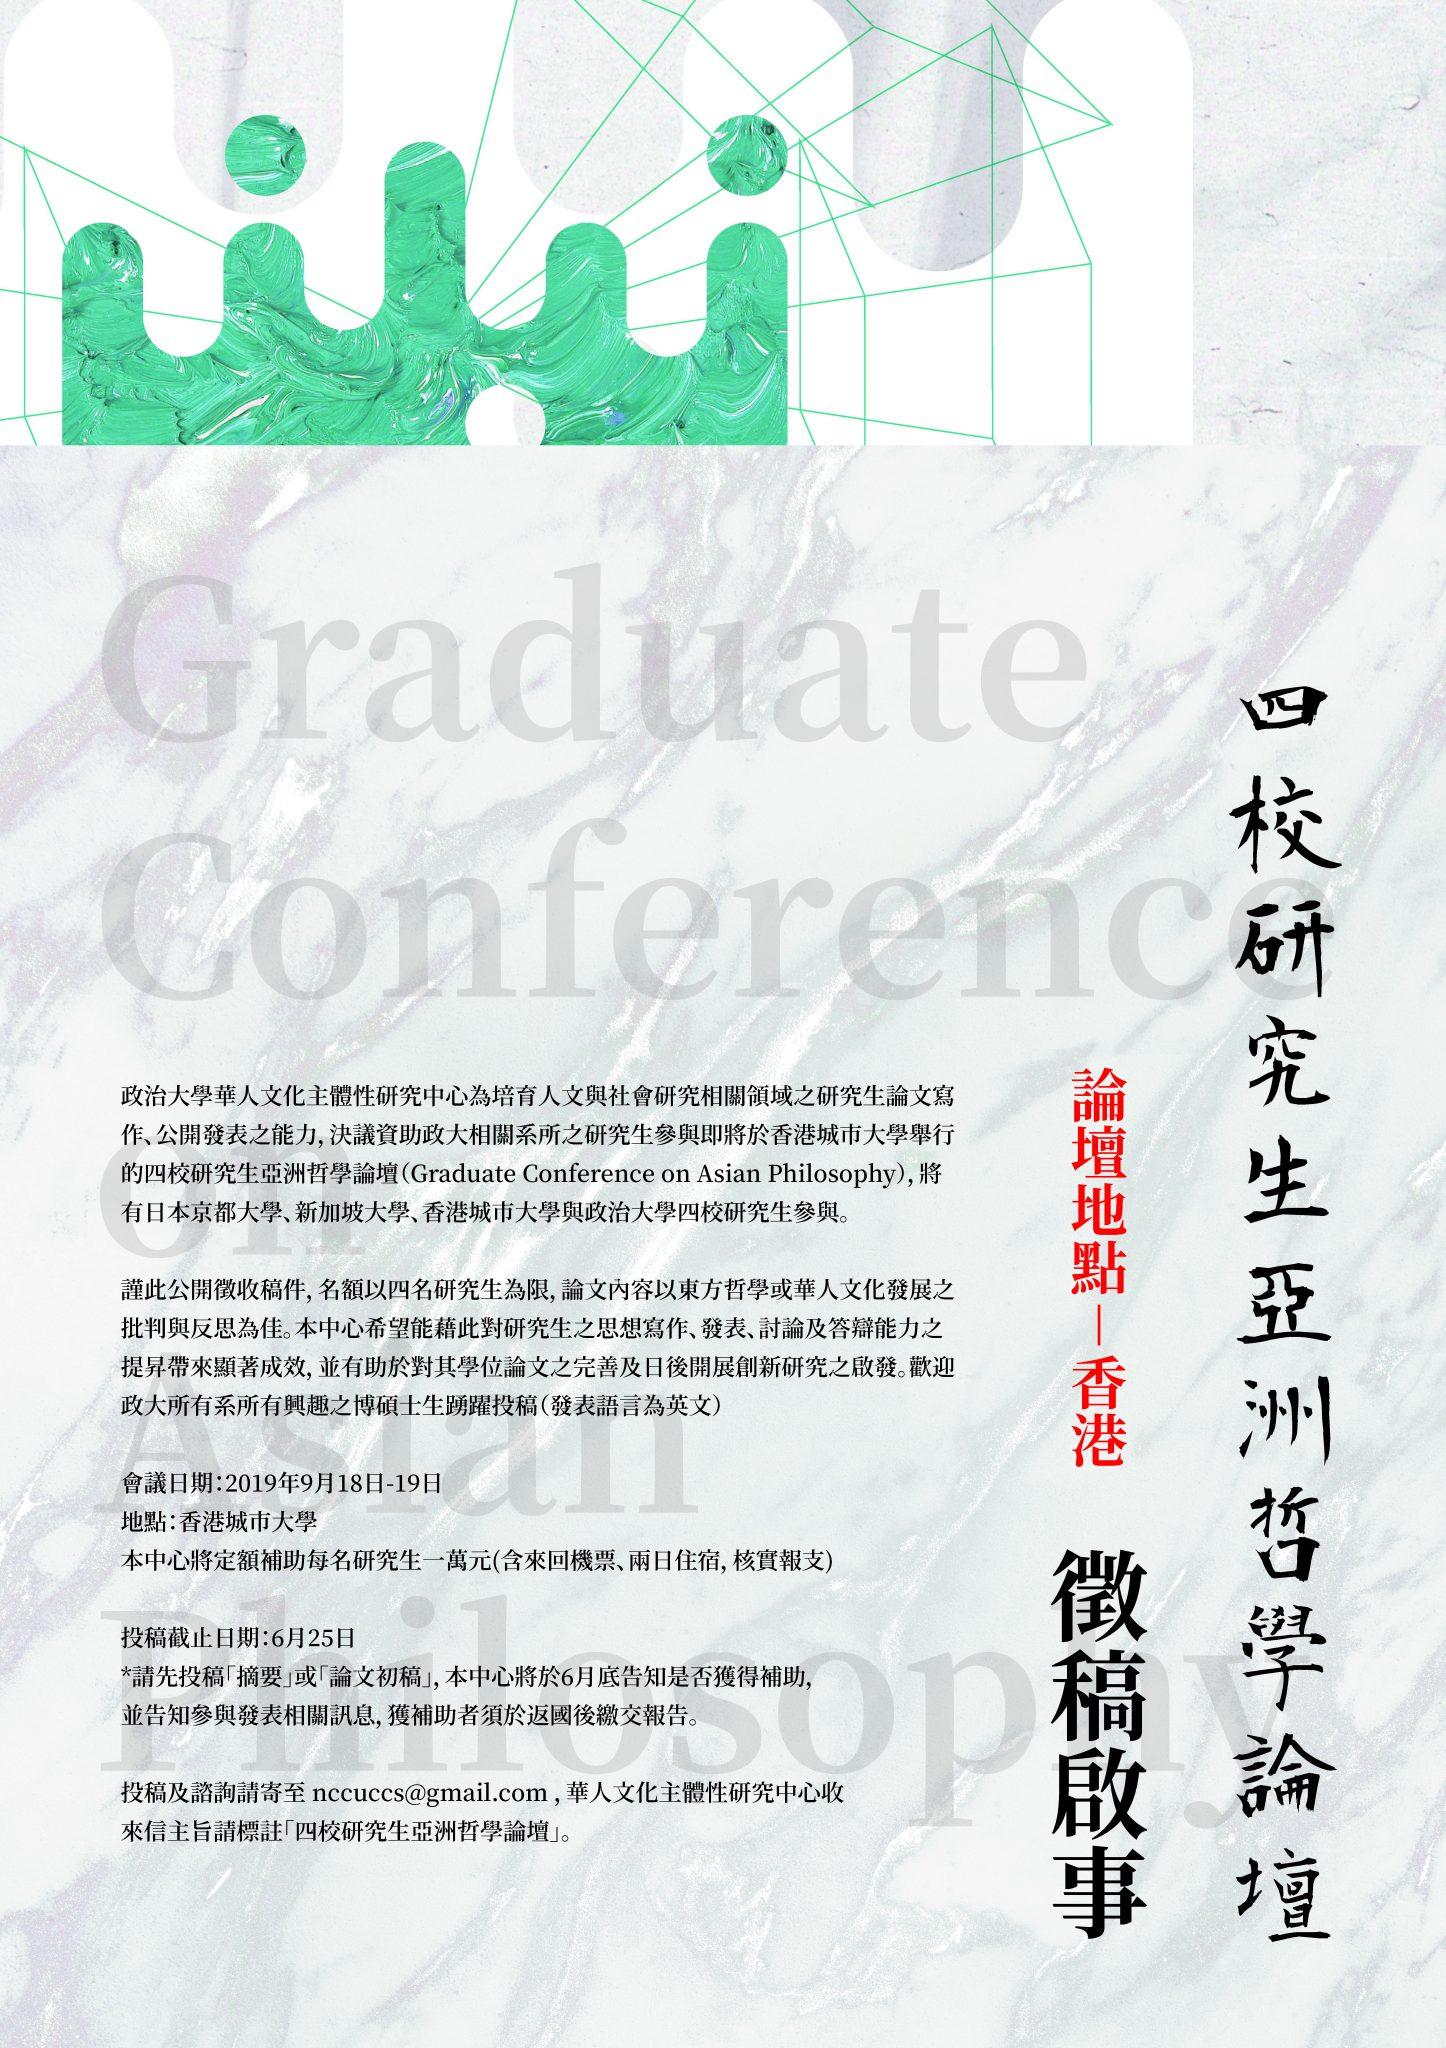 【徵稿啟事】 2019年9月赴香港參加四校研究生亞洲哲學論壇 (Graduate Conference on Asian Philosophy)